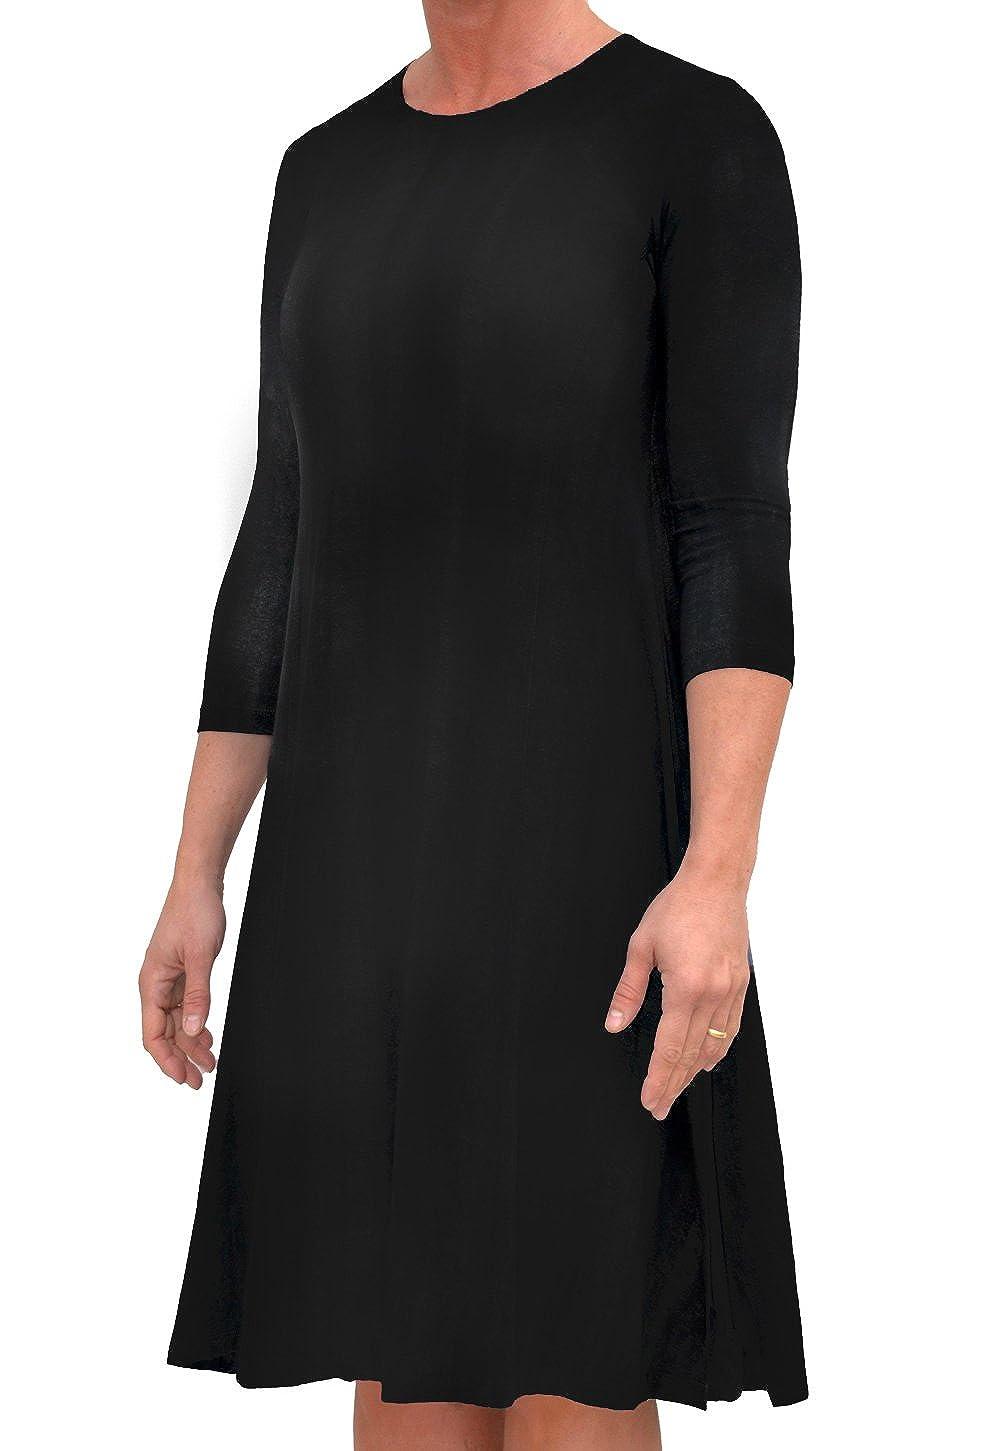 0de602fe2831 Kosher Casual Women's Modest A-Line Trapeze Midi Dress Closed Neckline 3/4  Sleeves Hi-Lo Hemline at Amazon Women's Clothing store: